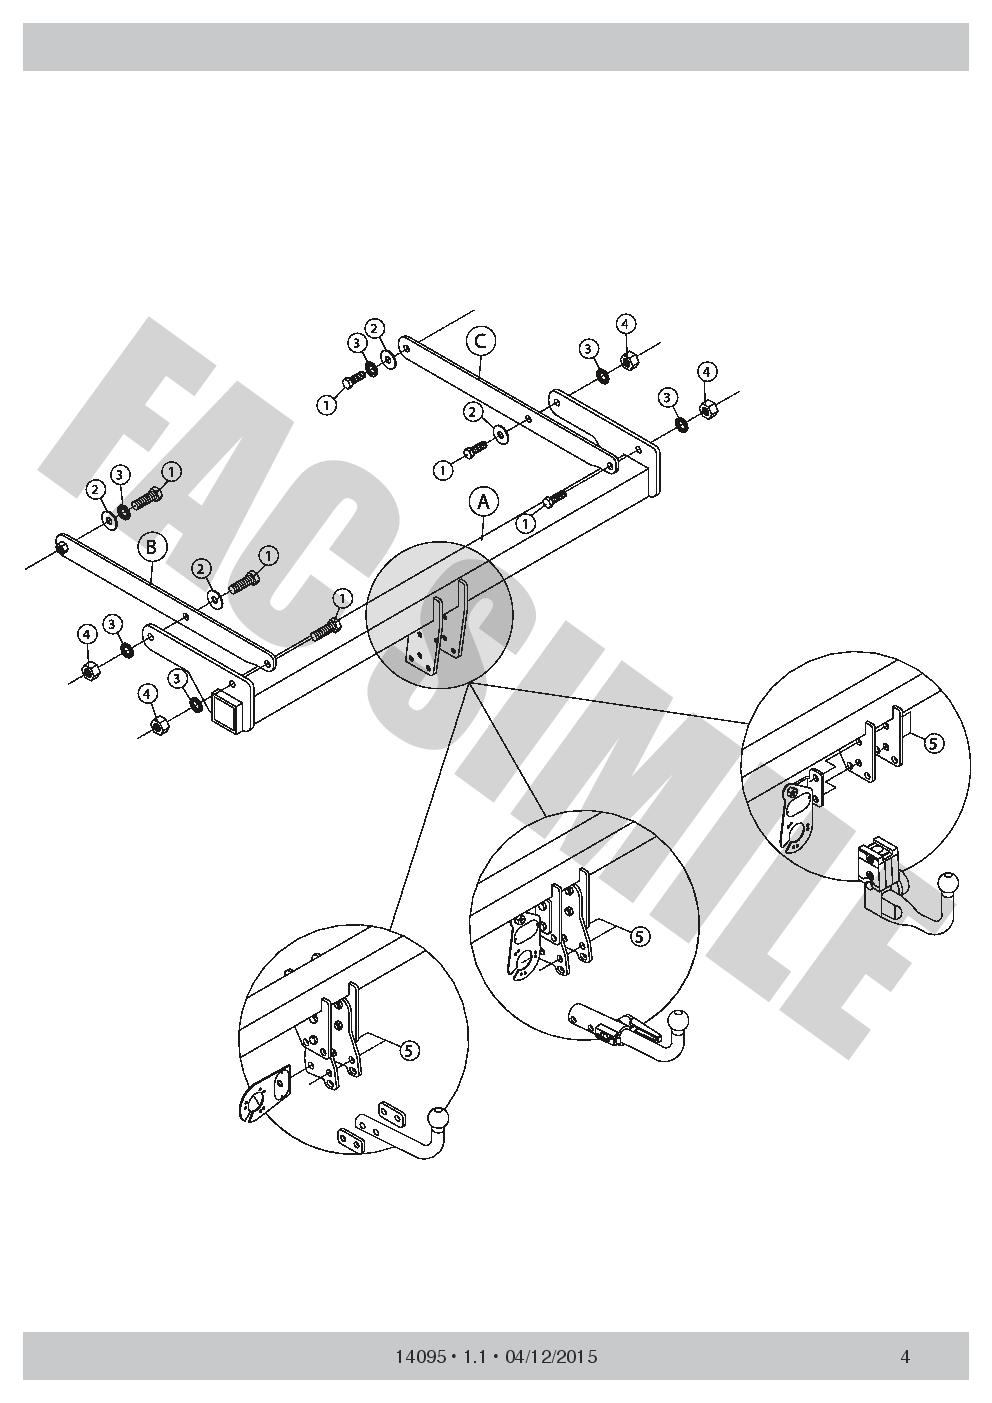 Vertical Detachable Towbar 13 Pin Kit C2 Wiring Tow Bar For Ford Mondeo Diagram